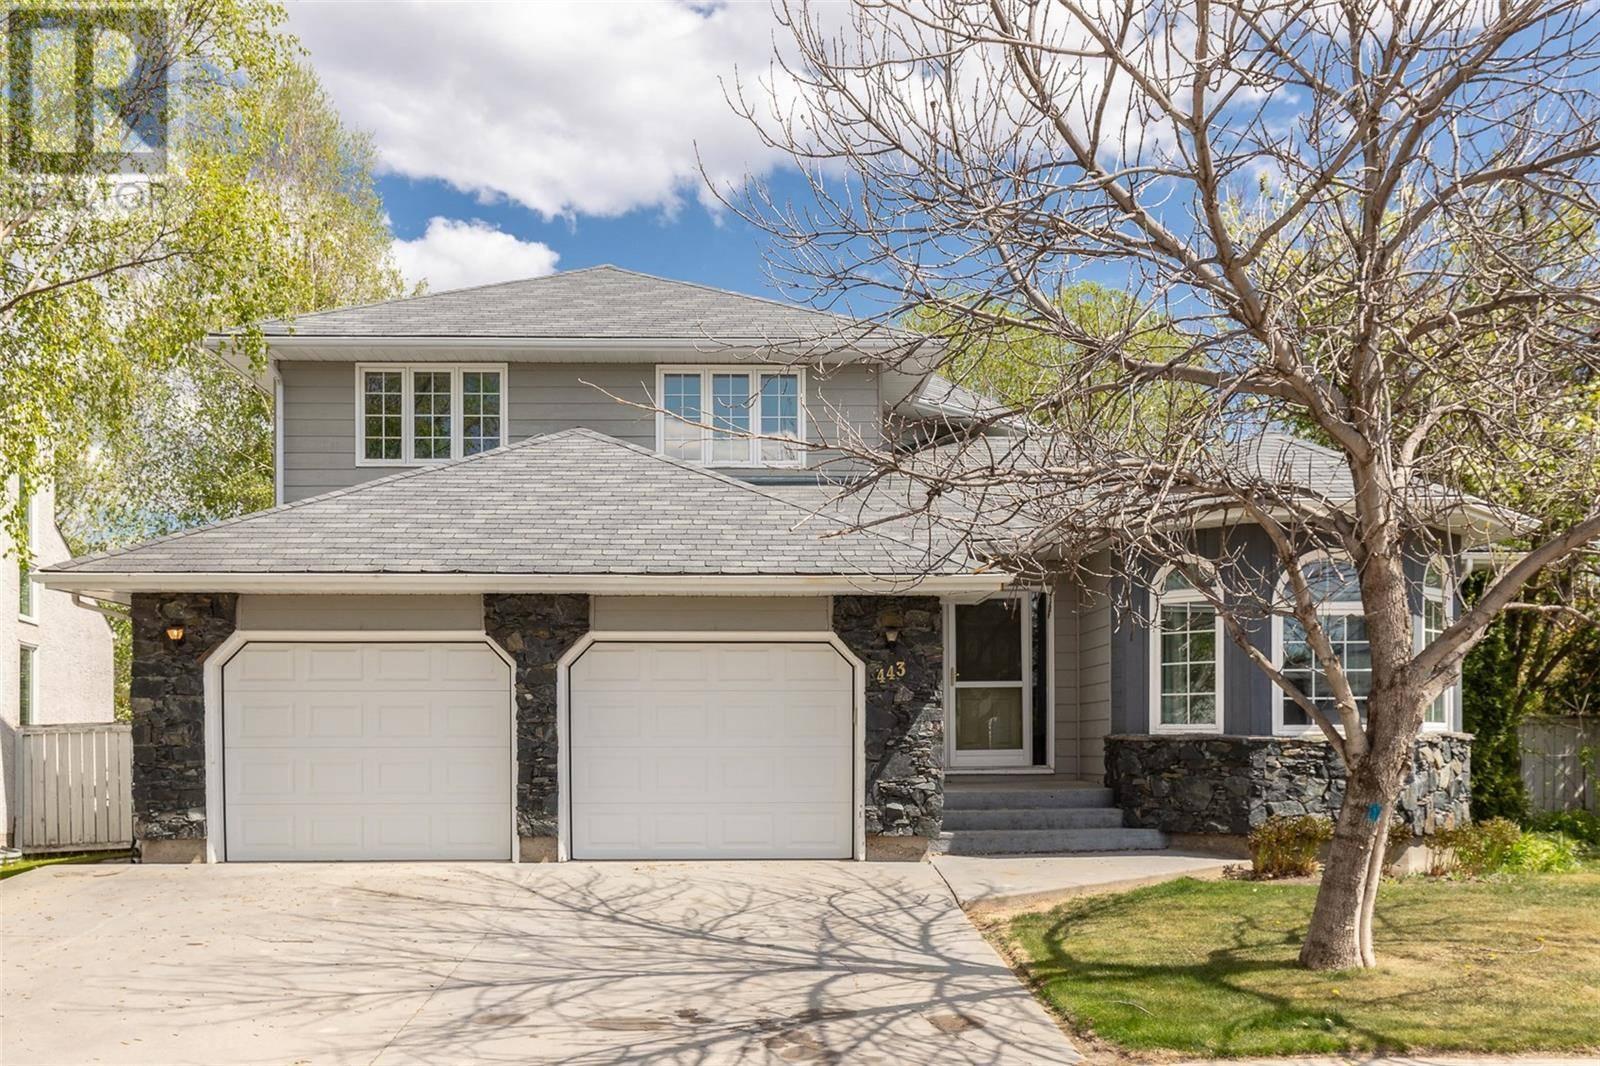 House for sale at 443 Rogers Ct Saskatoon Saskatchewan - MLS: SK784226